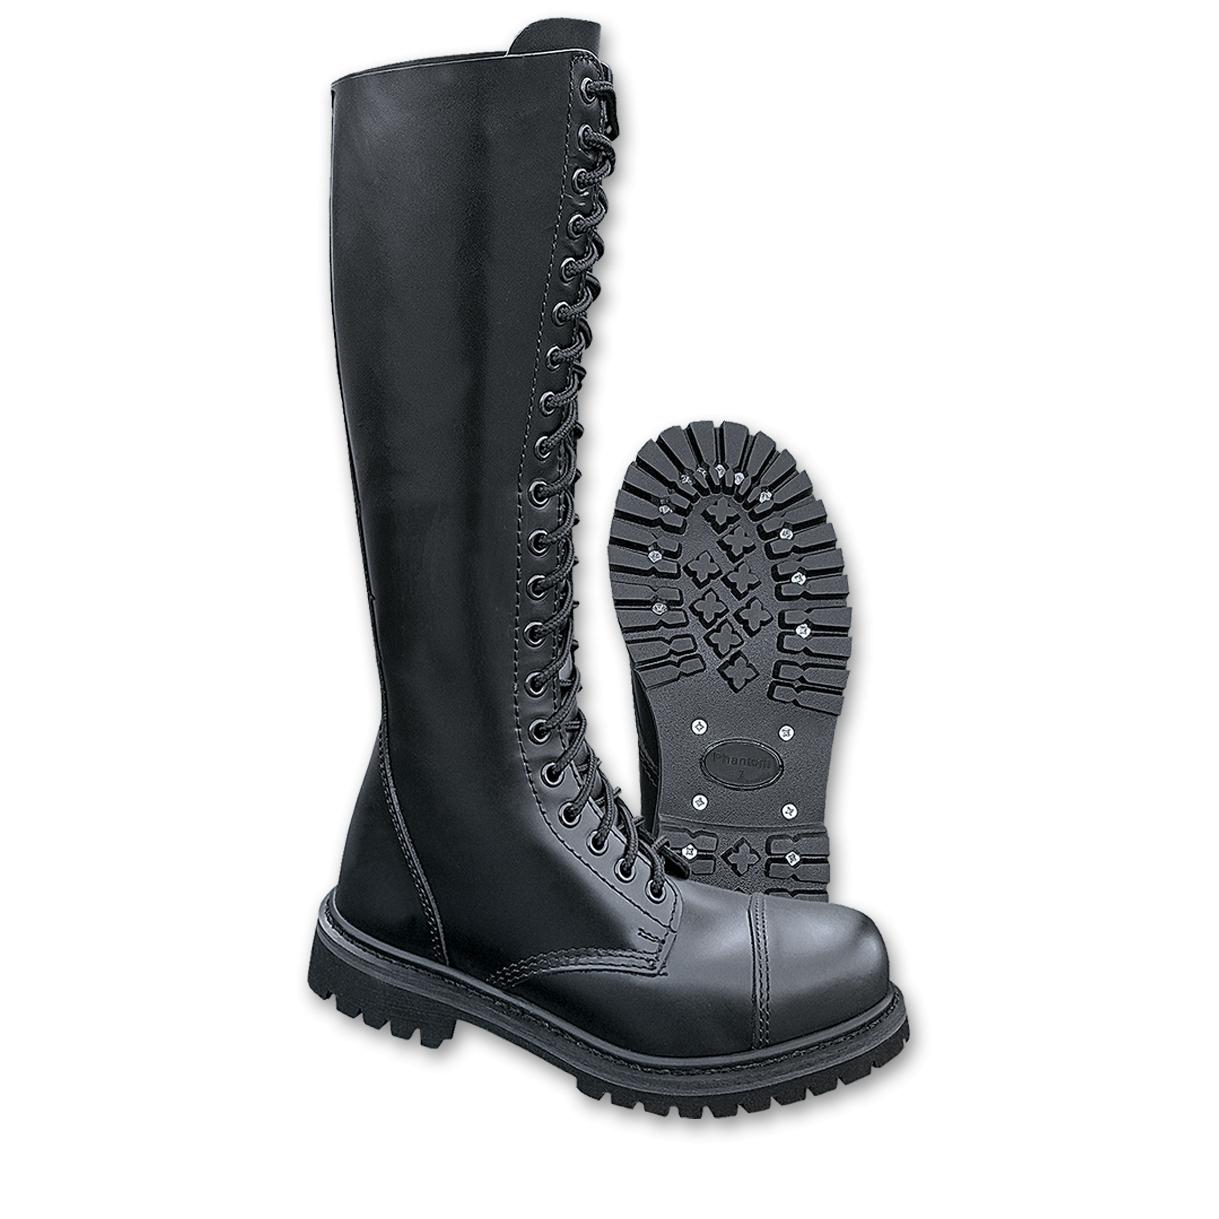 70618fac8bd Boty Brandit Phantom Boots 20-dírkové - černé - Army shop a outdoor ...